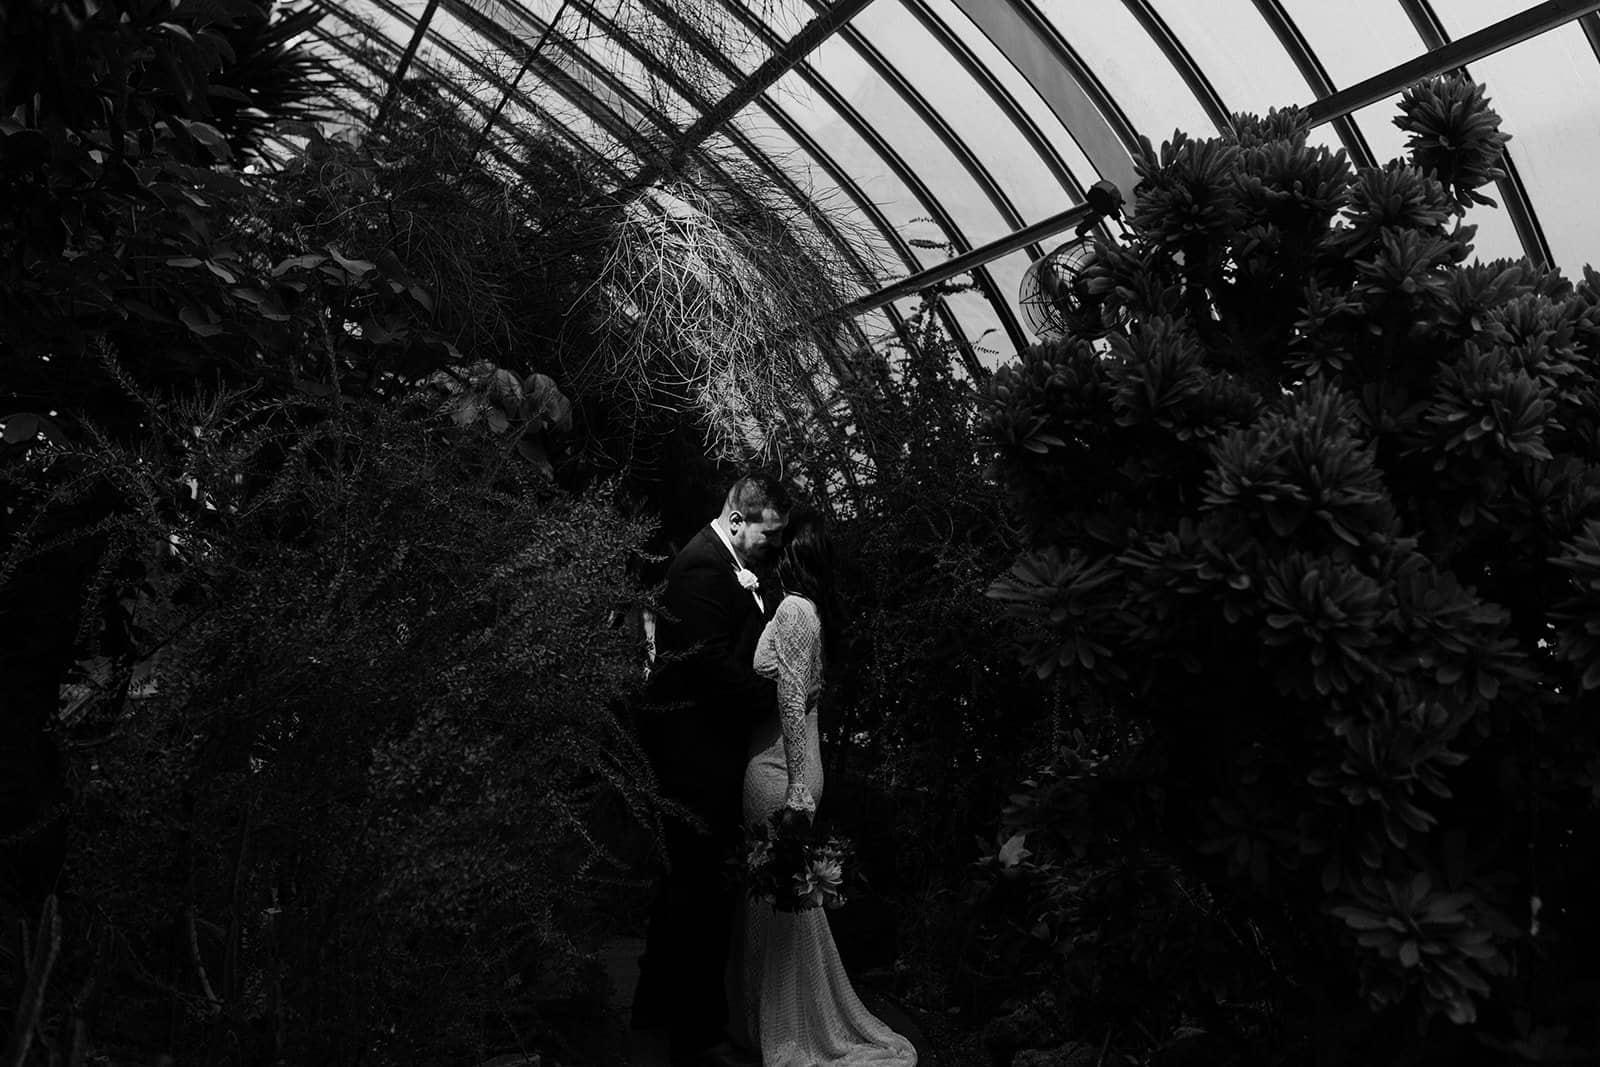 spotlight on newly wed couple